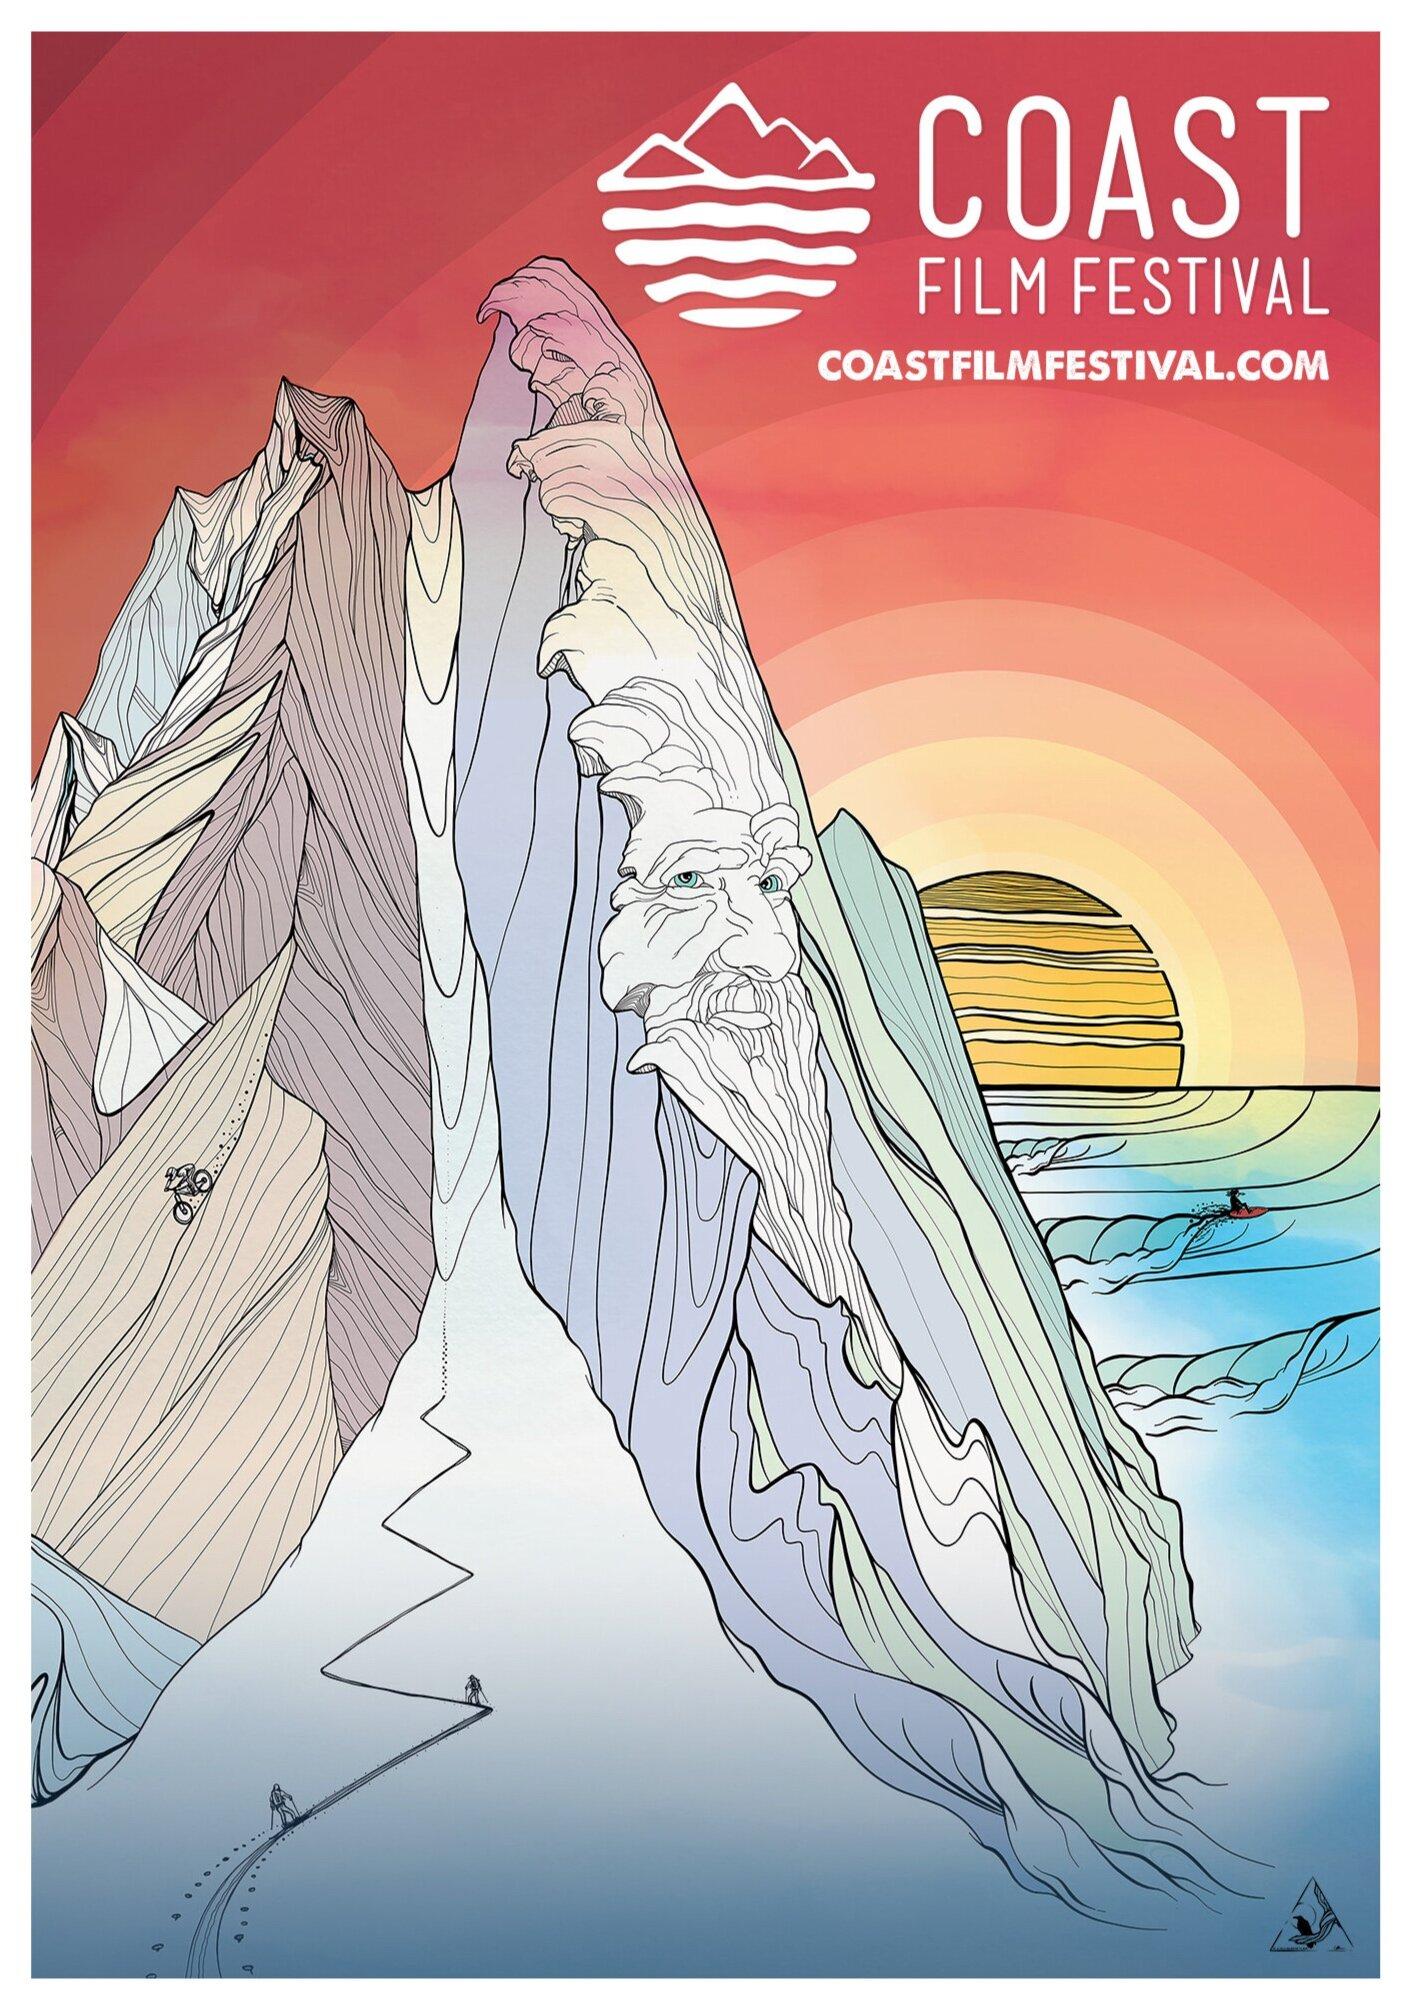 Coast Film Festival 2021